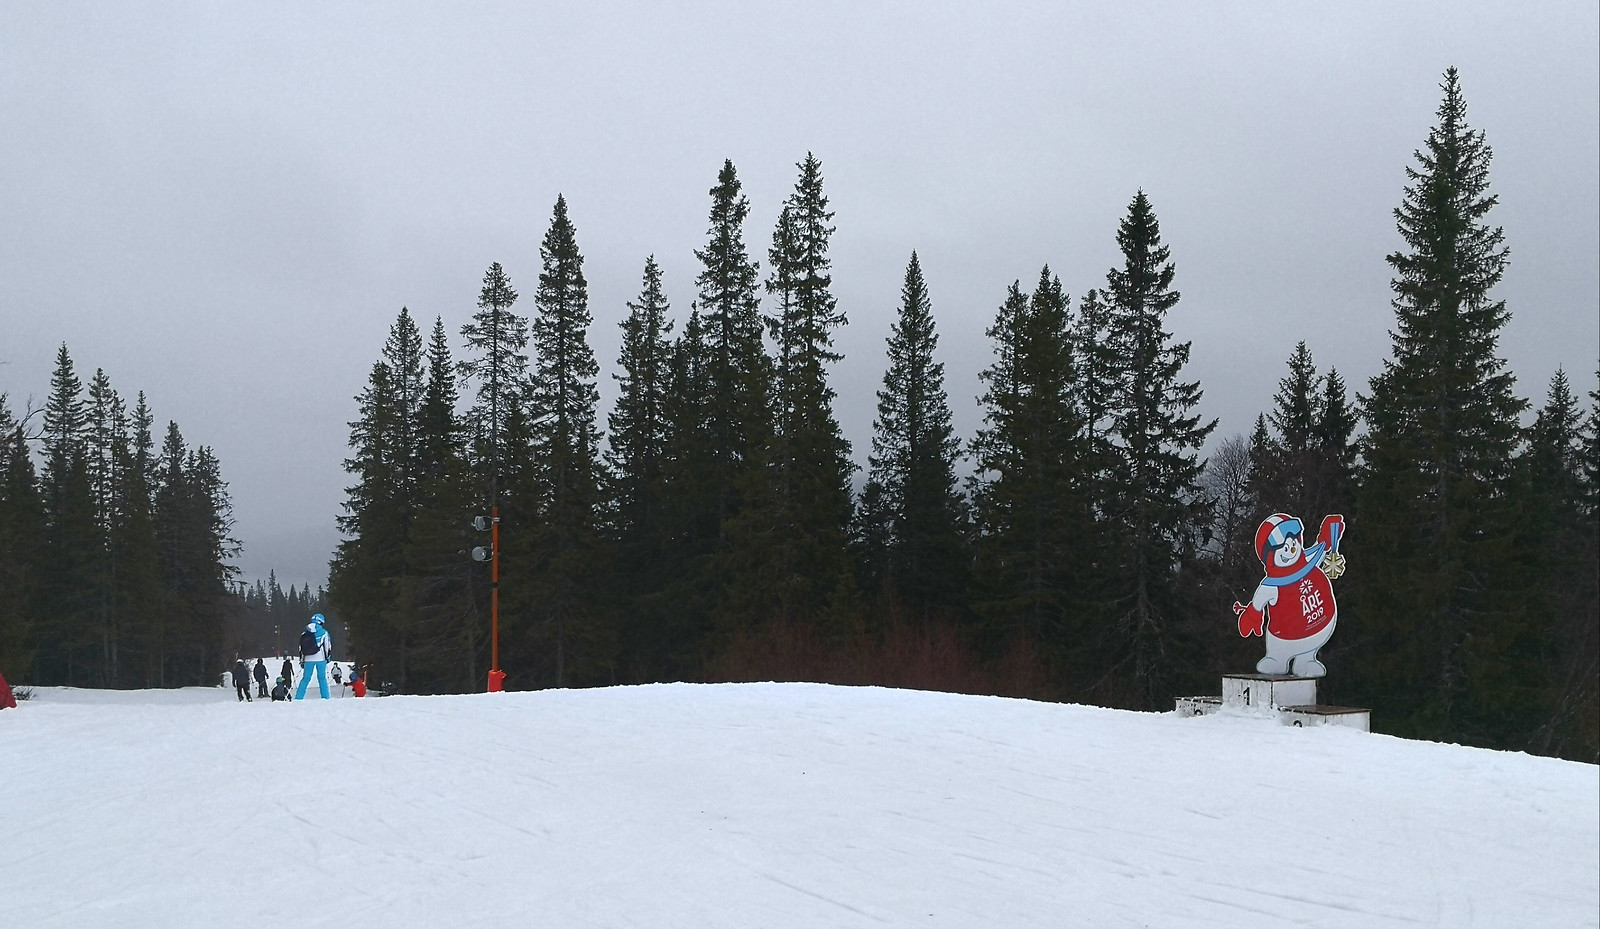 Skidland beginners' area